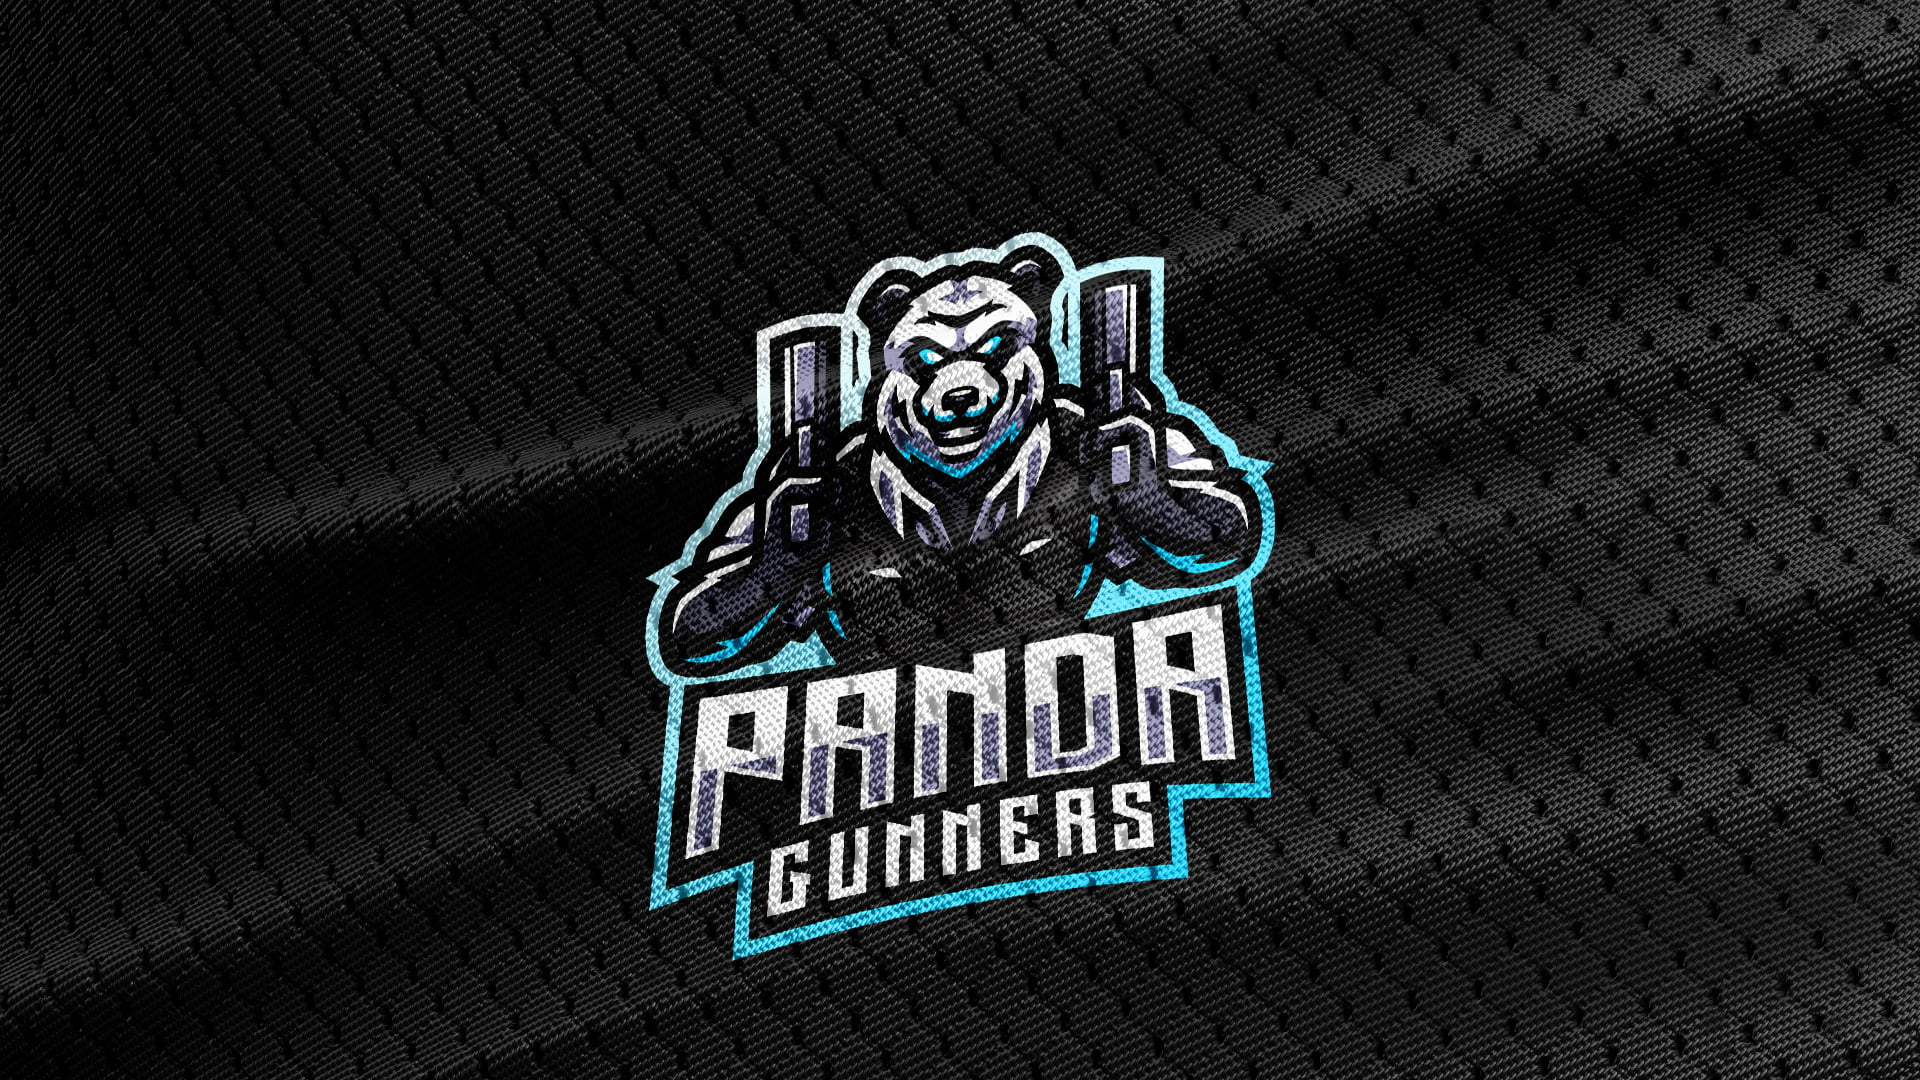 Black-Jersey-Texture-Free-Download-Panda-Bear-Mascot-Logo